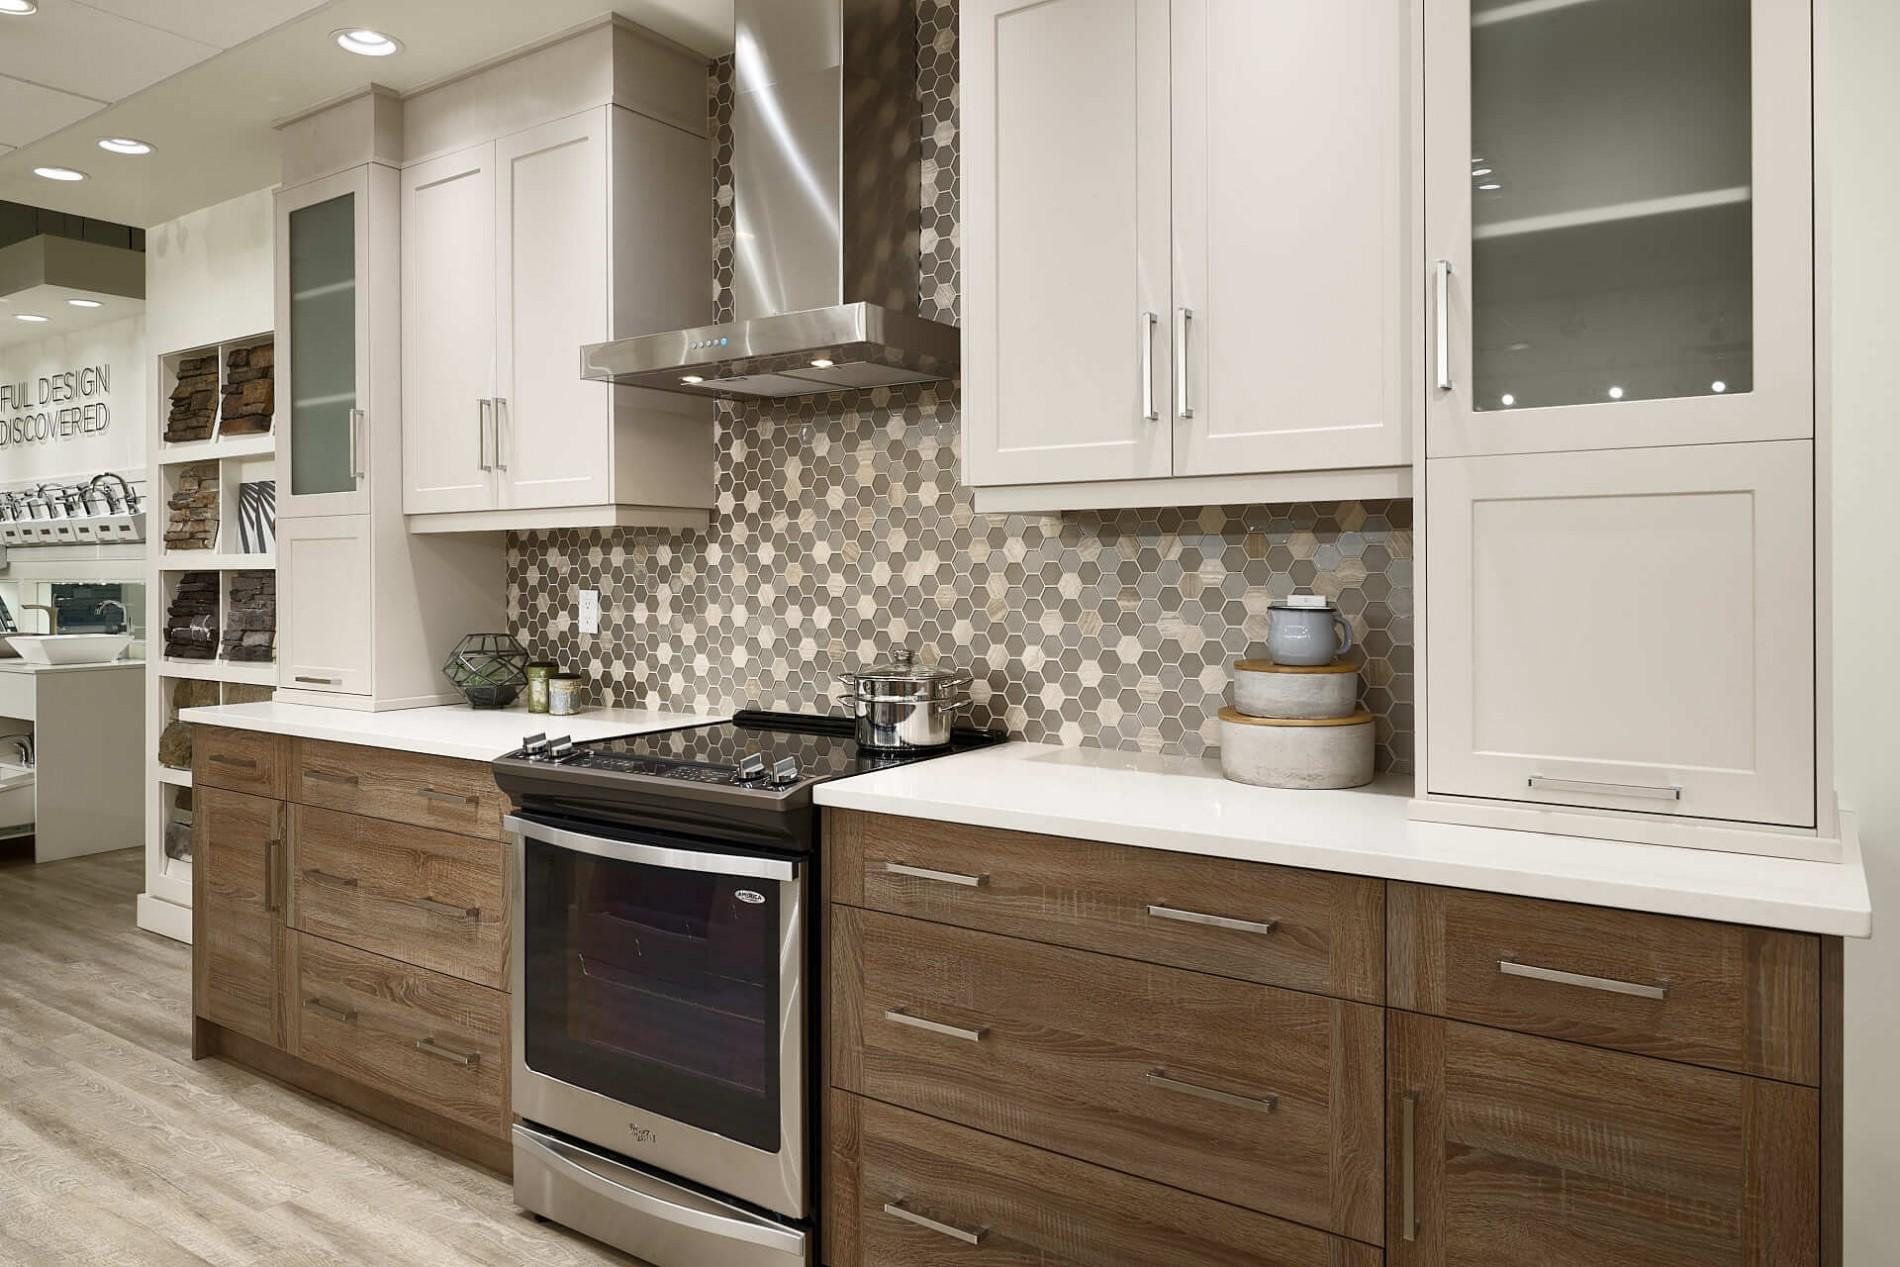 78 Design Studio » Calbridge Homes on home architecture, home design philippines, home floor plans and designs, home decor,